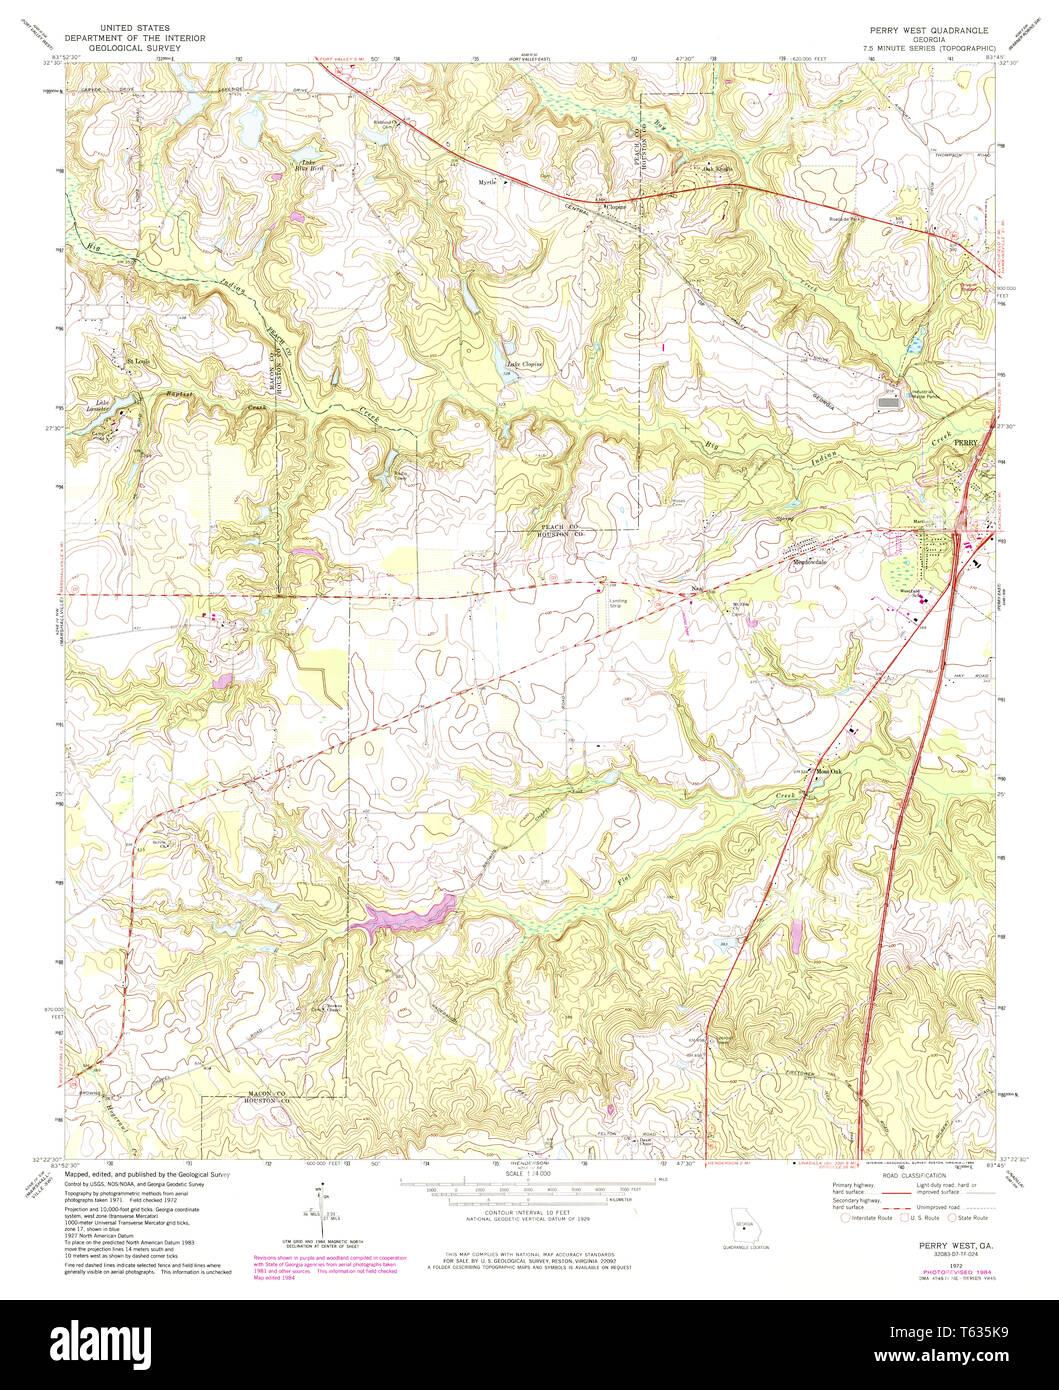 Map Of Georgia 75.Usgs Topo Map Georgia Ga Perry West 246638 1972 24000 Restoration